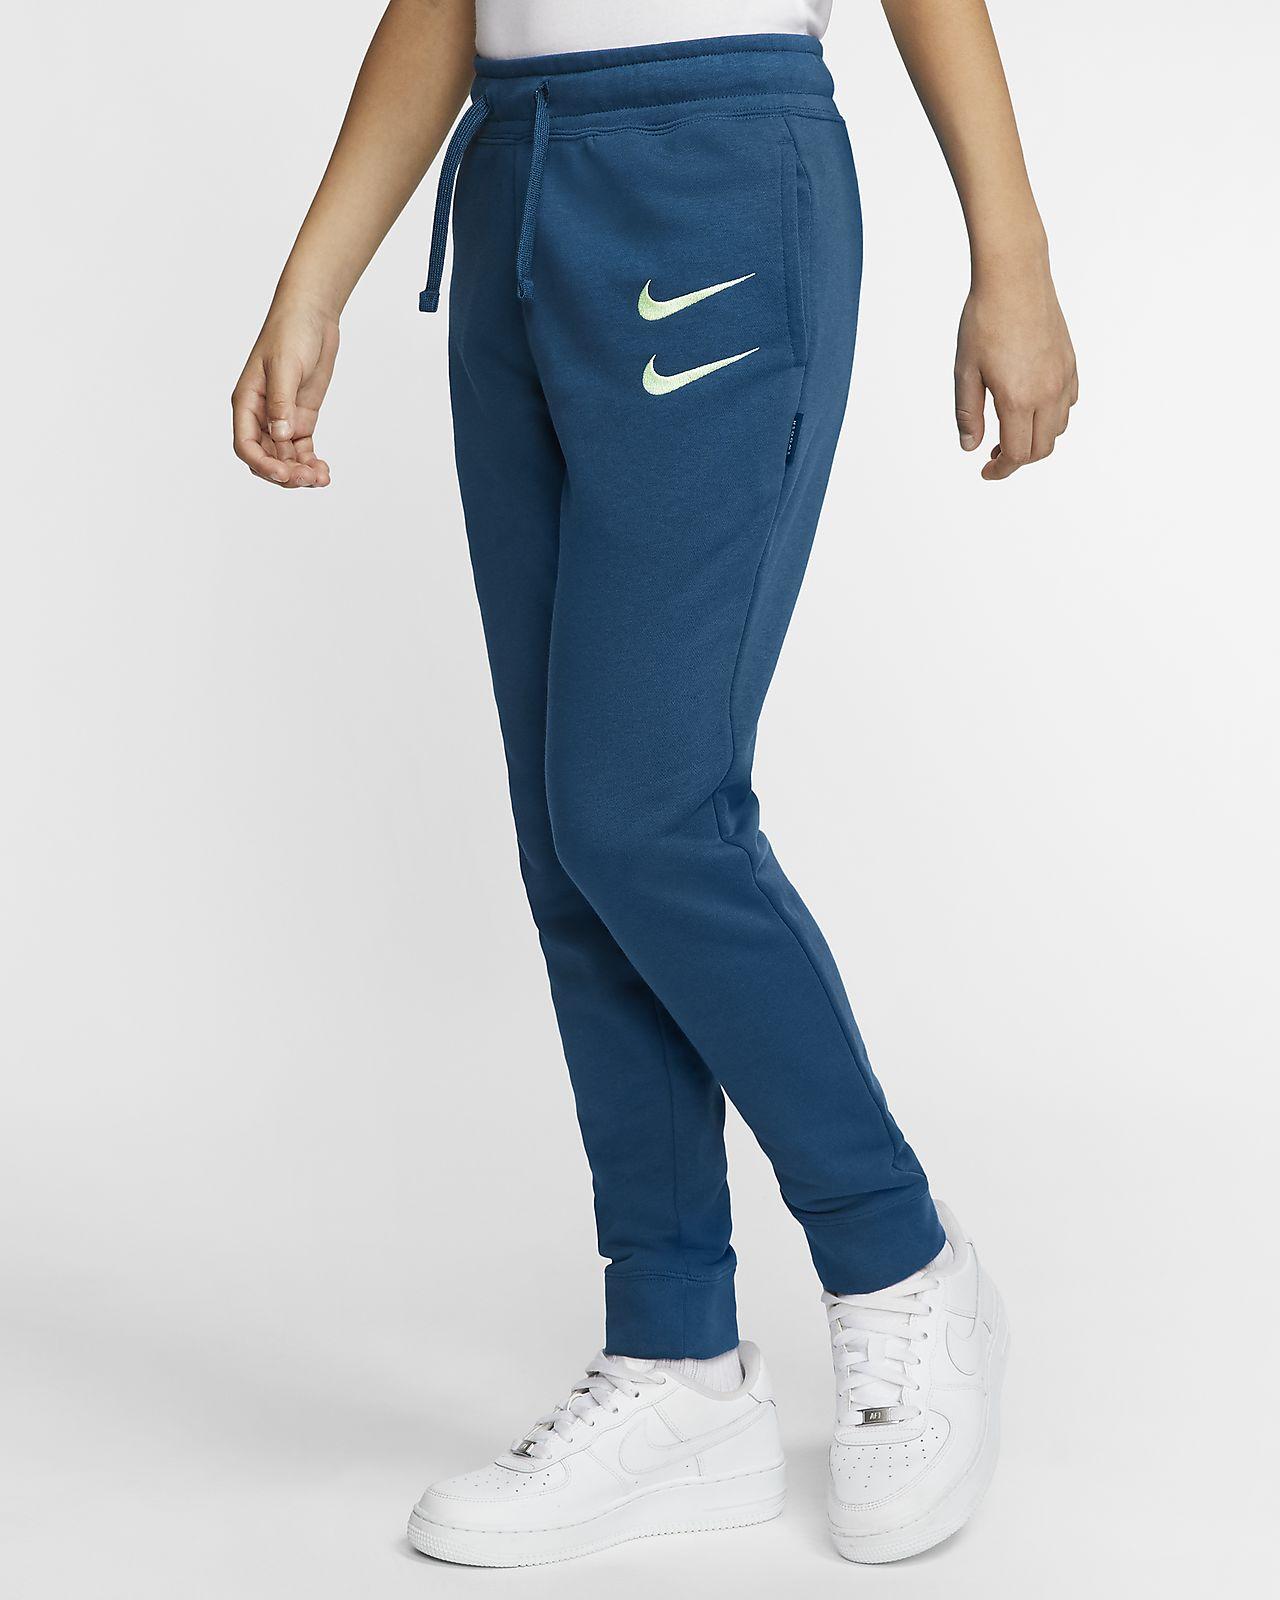 Nike Sportswear Swoosh Pantalón de tejido French terry - Niño/a